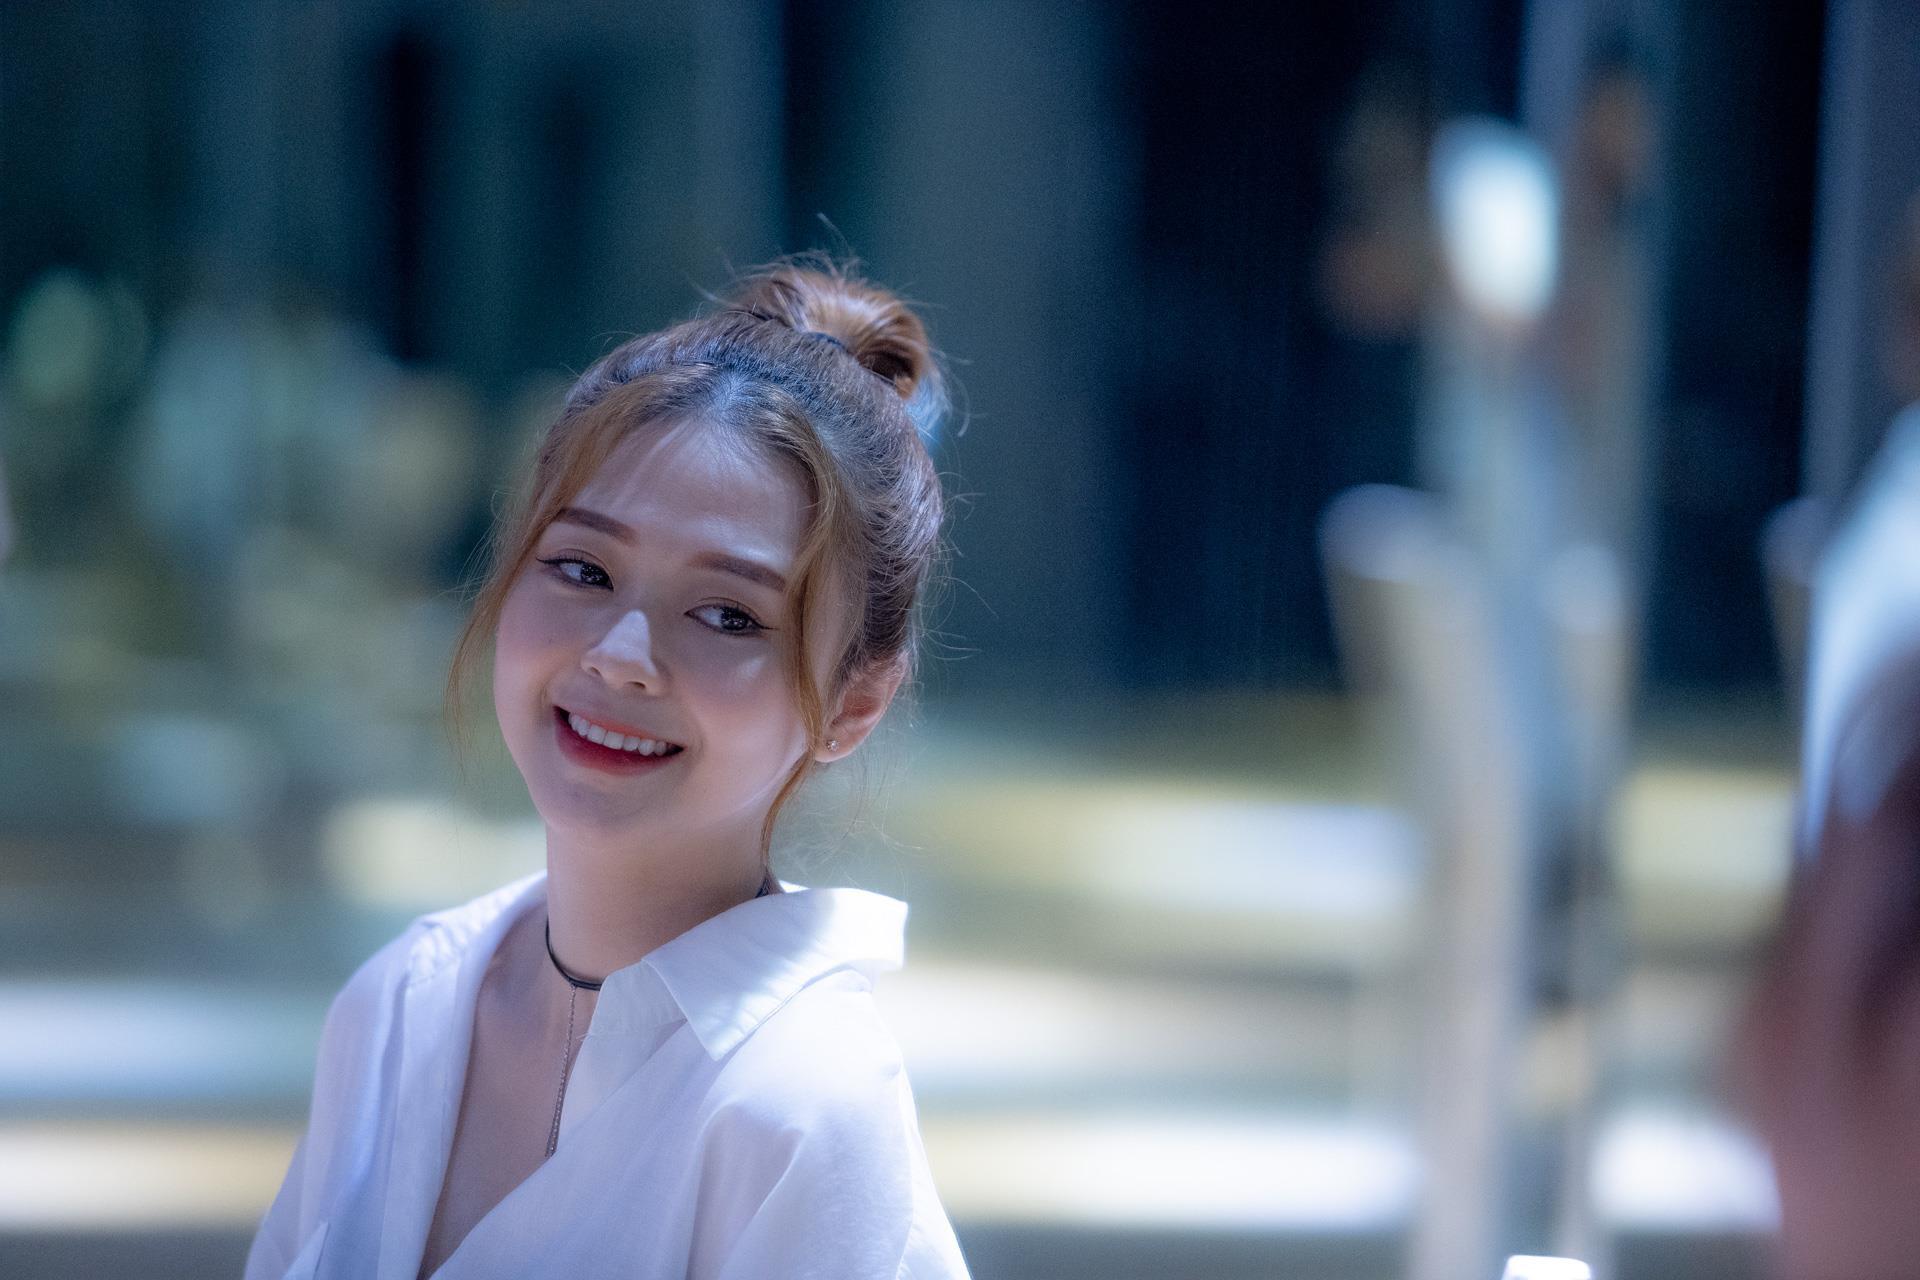 'Ban gai' goi cam lan dau noi ve tinh yeu voi Trinh Thang Binh hinh anh 1